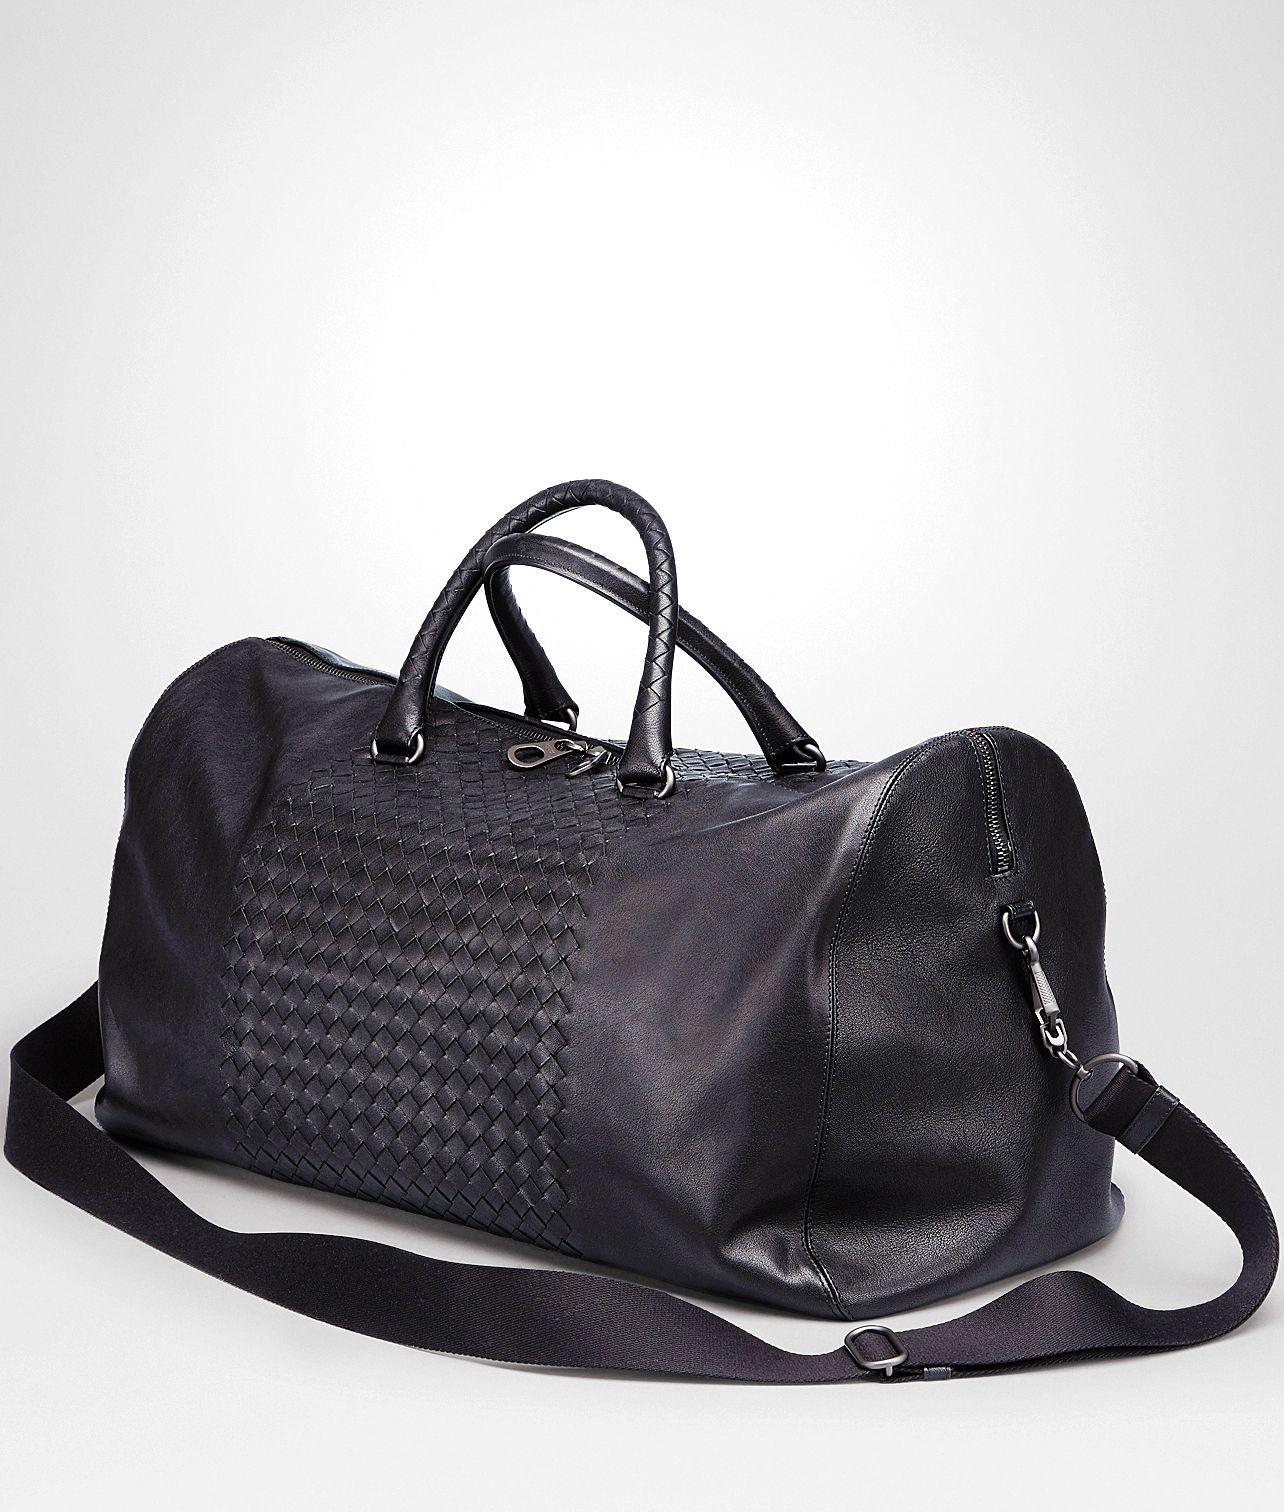 52f6cca53ea19 Bottega Veneta Nero Intrecciato Washed Nappa Duffel Bag  fashionbag ...